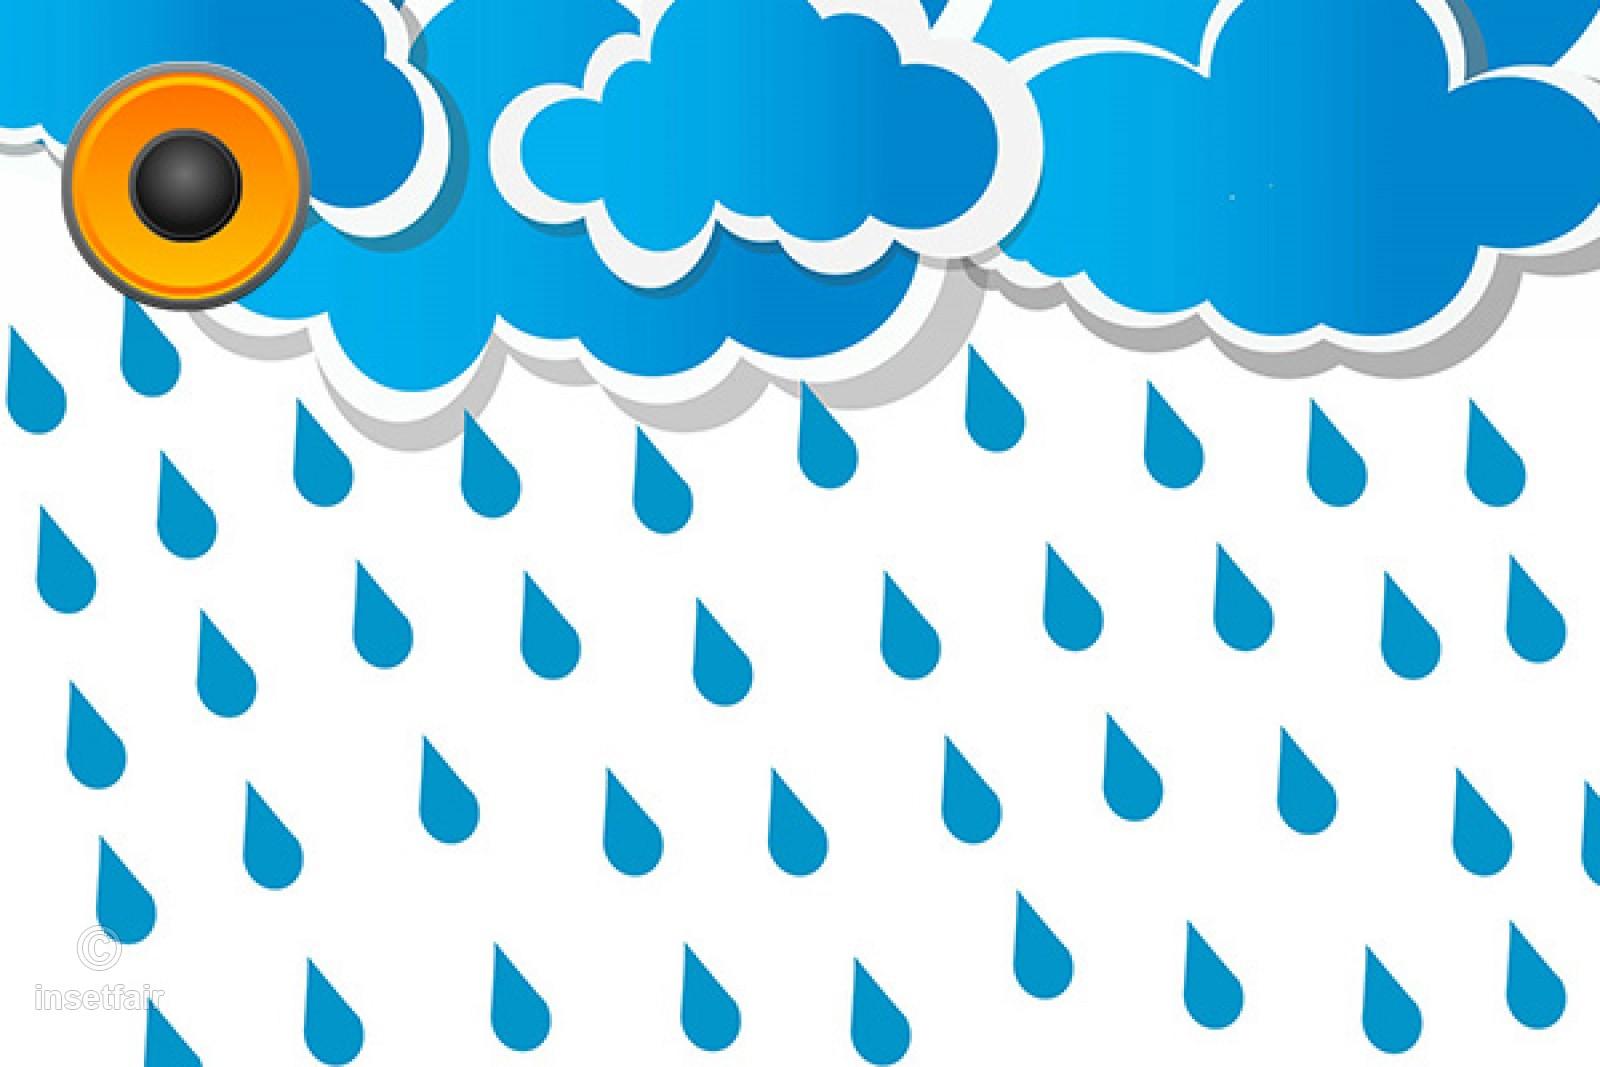 Thunder sound clipart clipart transparent Rain with thunder sound and heavy rain follows clipart transparent